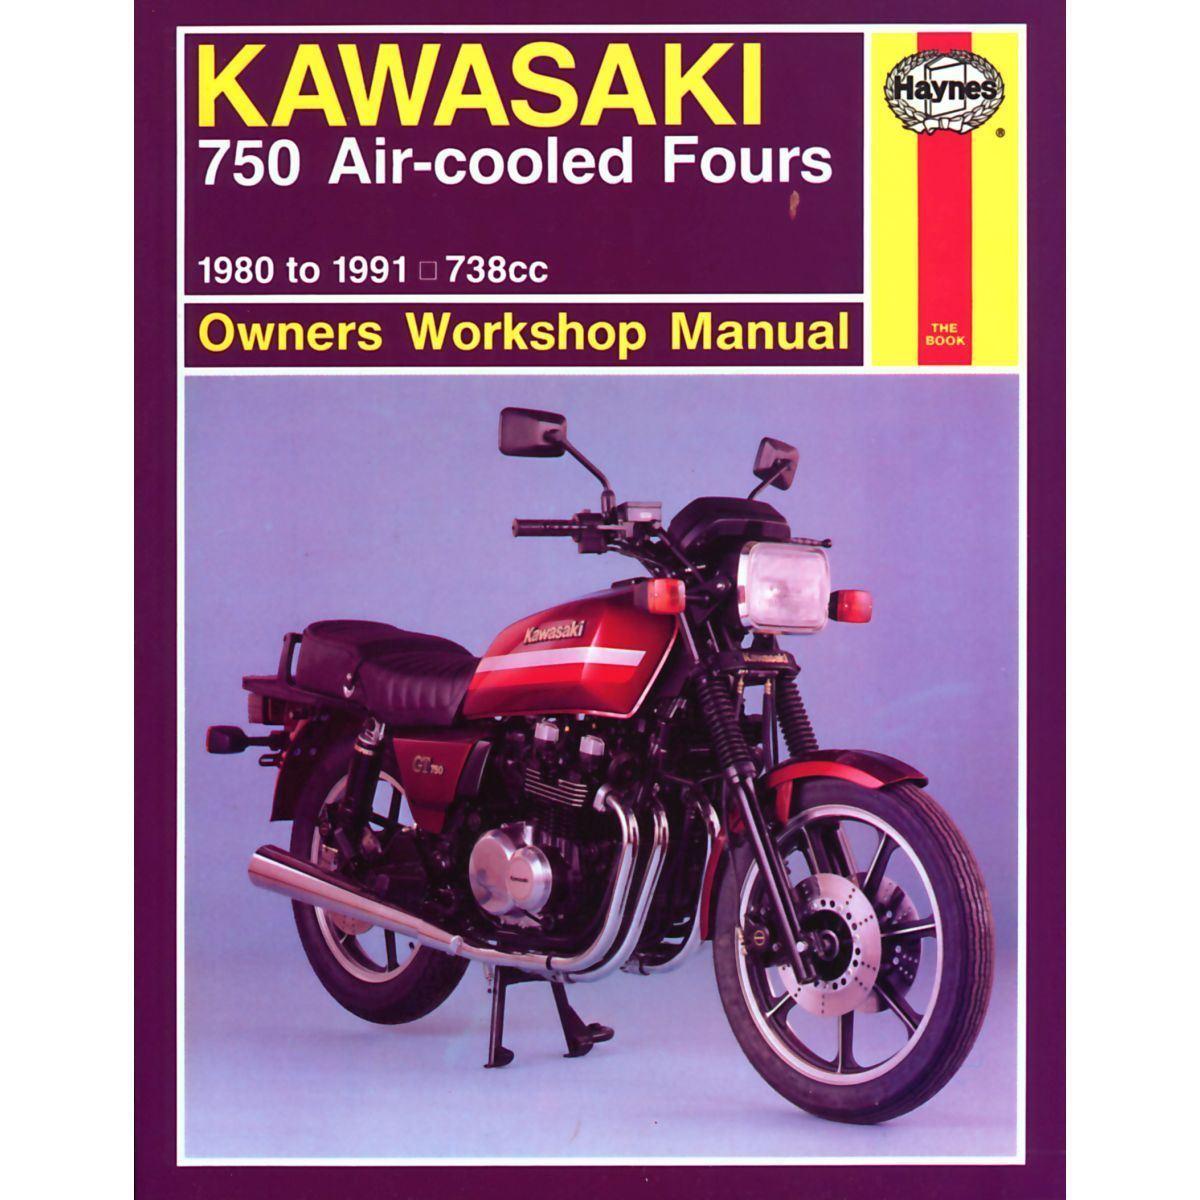 HAYNES MANUAL: KAWASAKI 750 AIR-COOLED FOURS 1980-1991